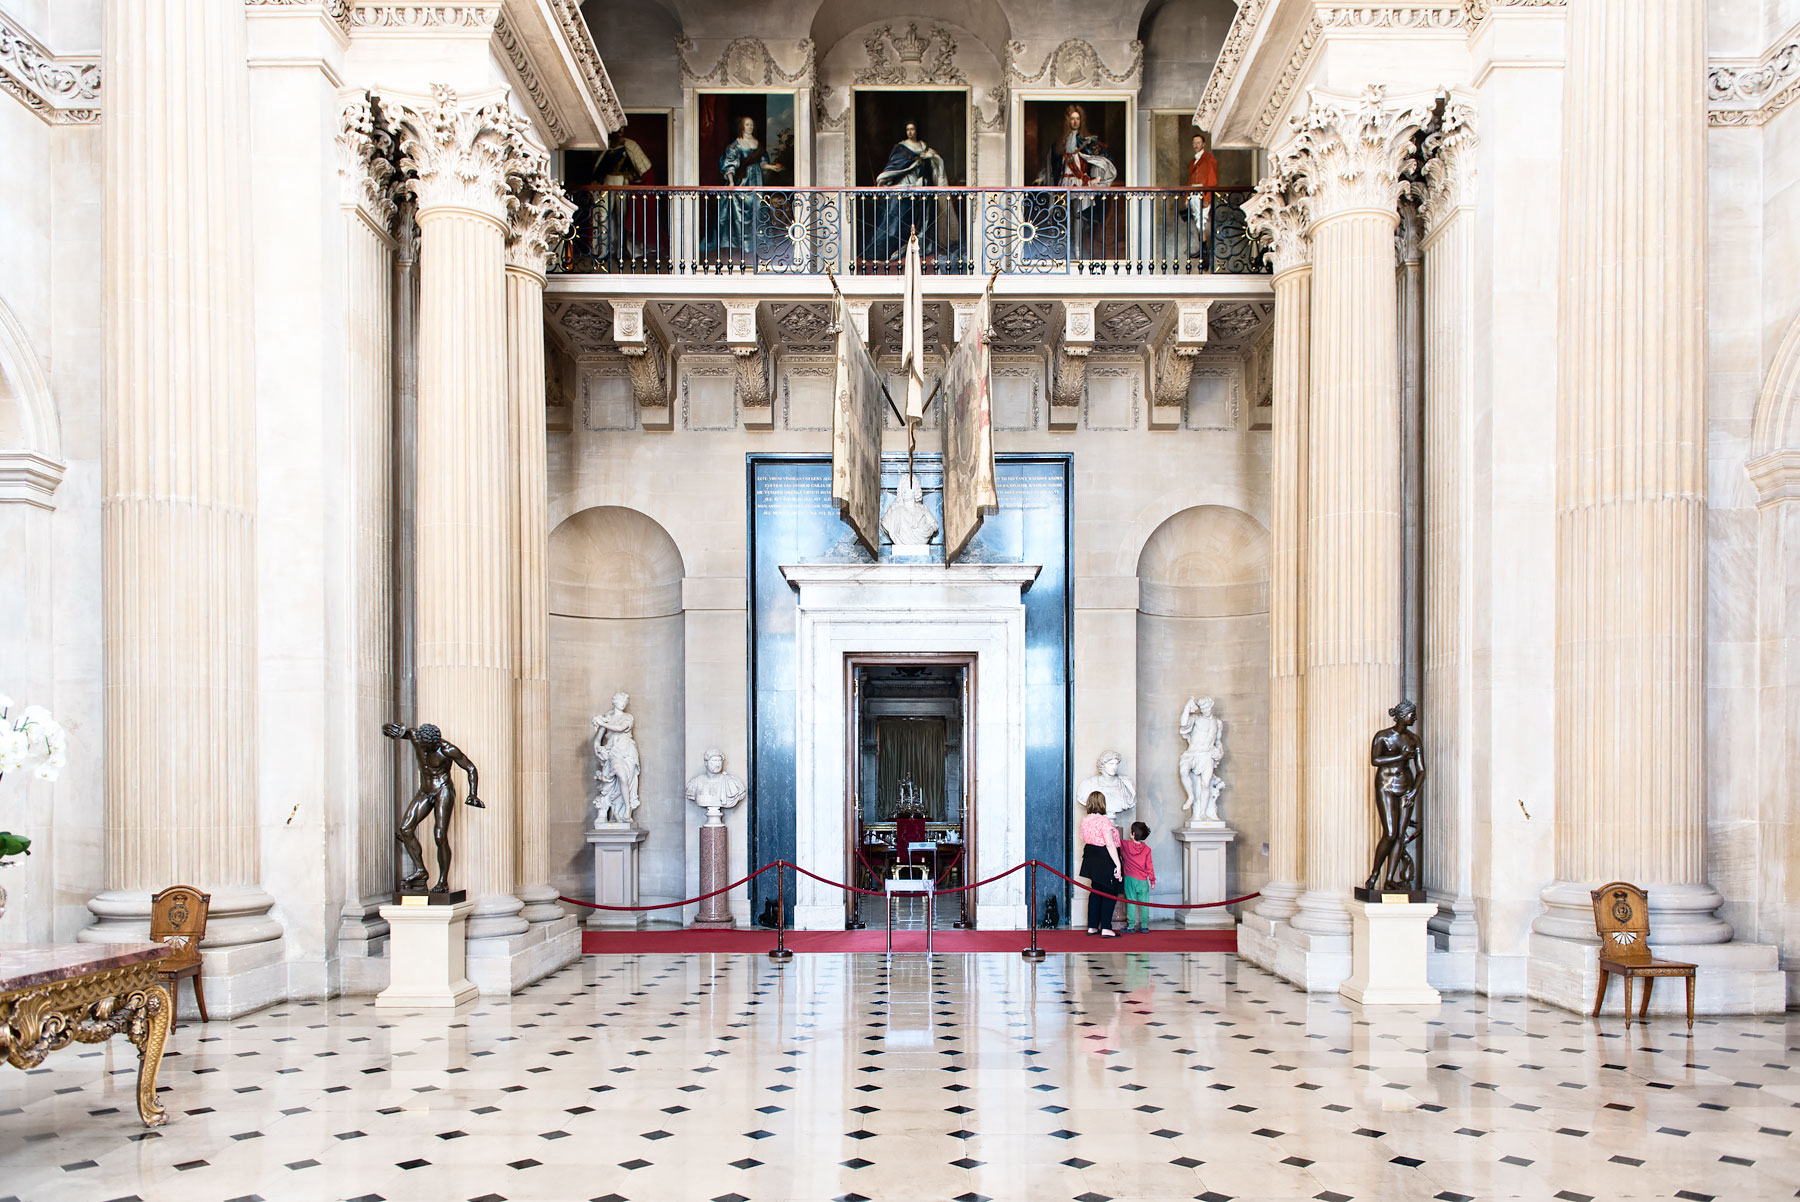 Blenheim-Palace-Entrance-Hall